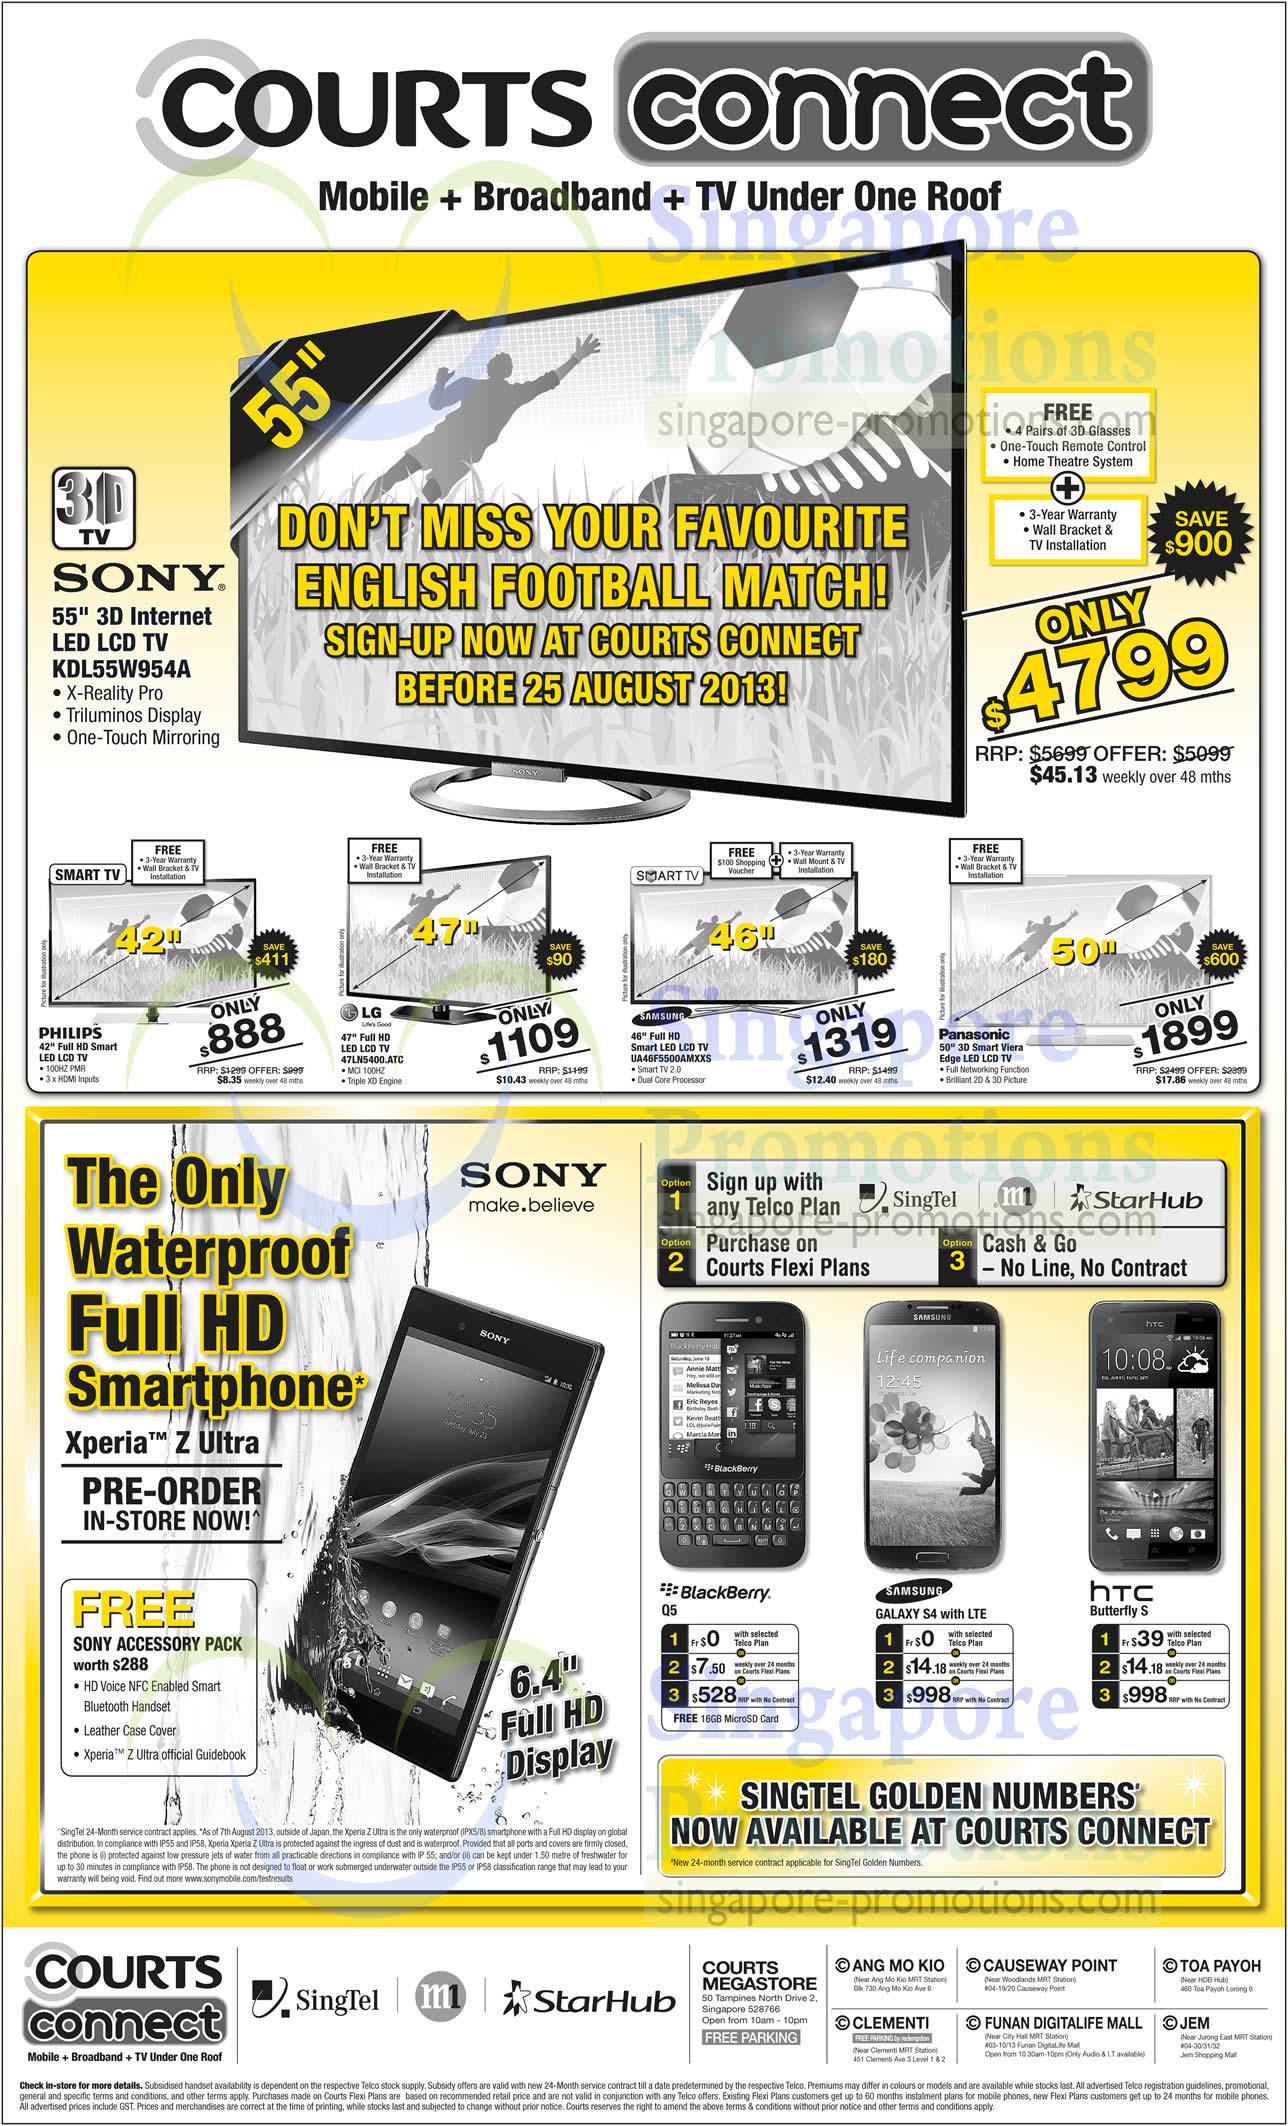 Sony KDL-55W954A TV, LG 47LN5400ATC TV, Samsung UA46F5500AMXXS TV, BlackBerry Q5, Samsung Galaxy S4 and HTC Butterfly S